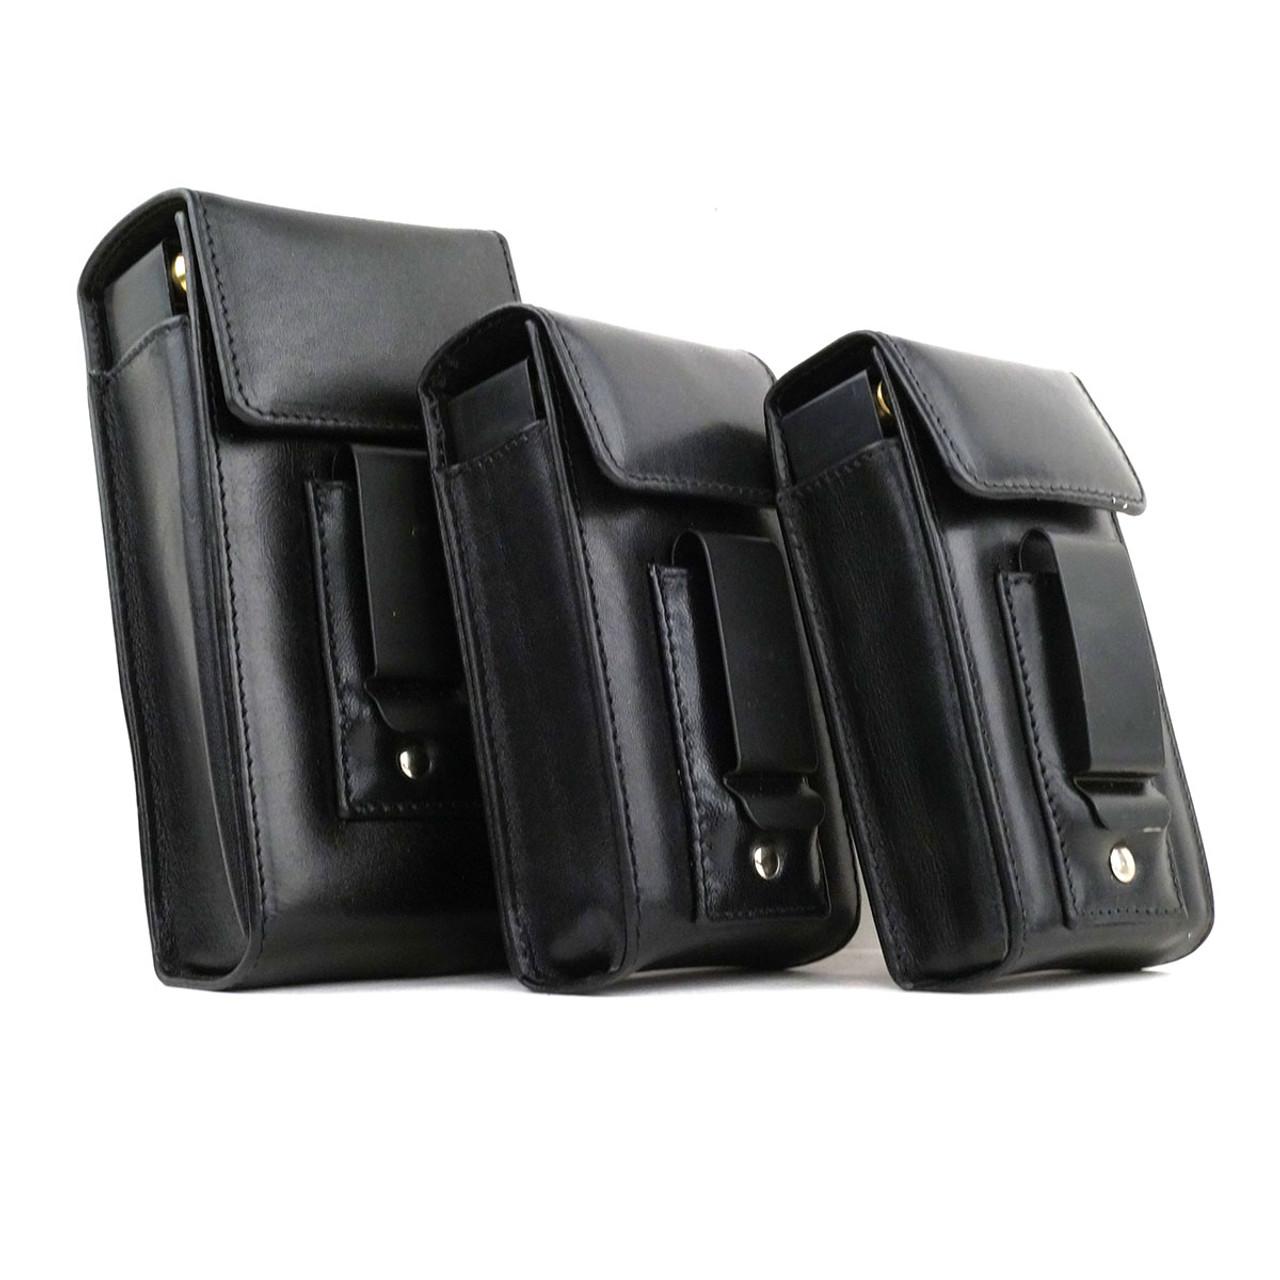 M&P 40c Leather Arsenal 50 Round Belt Case